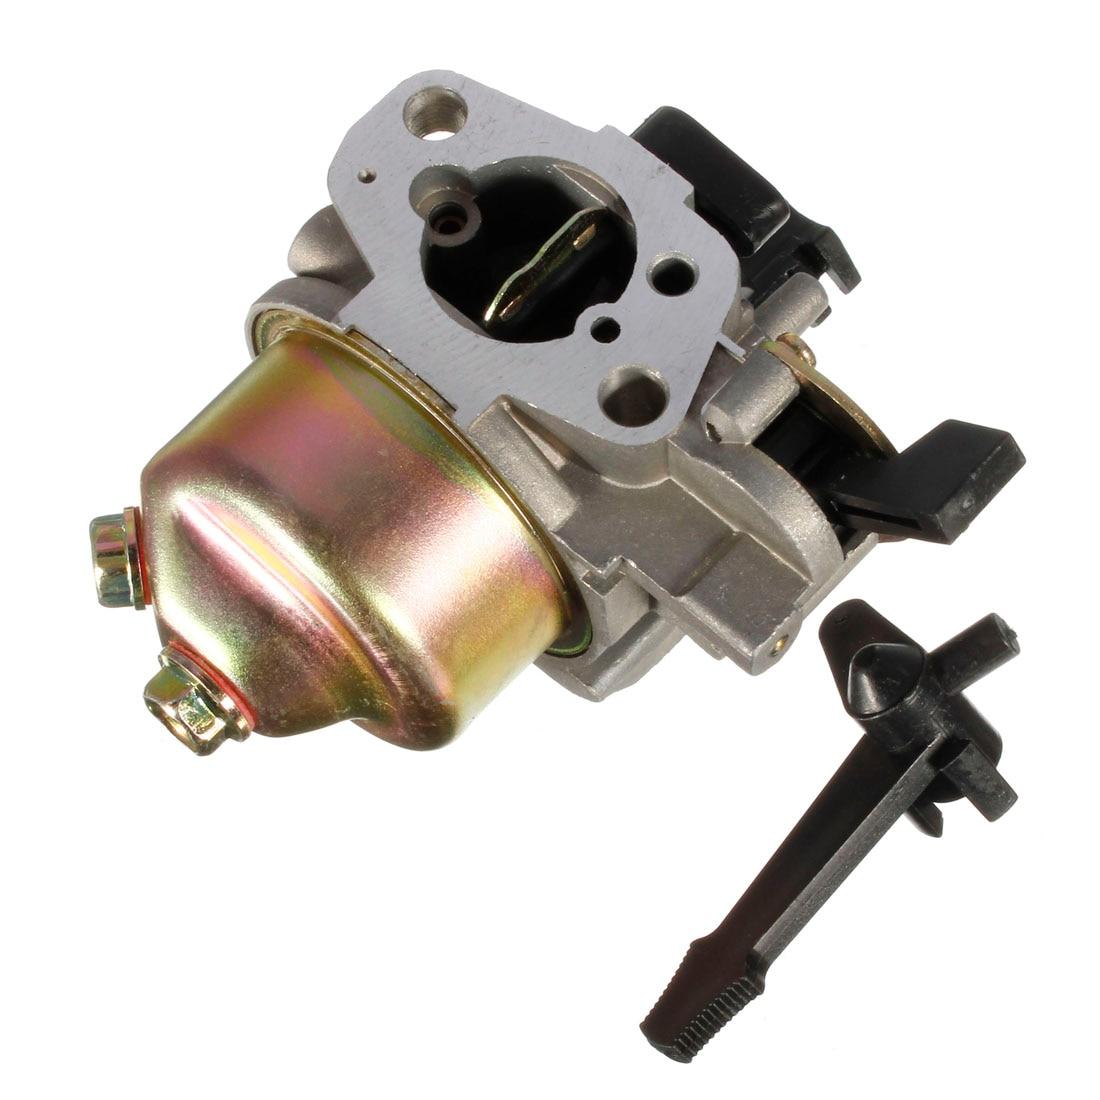 19 مللي متر Carburetor Carb عدة لهوندا GX160 5.5/6.5 ل HP GX200 16100-ZH8-W61